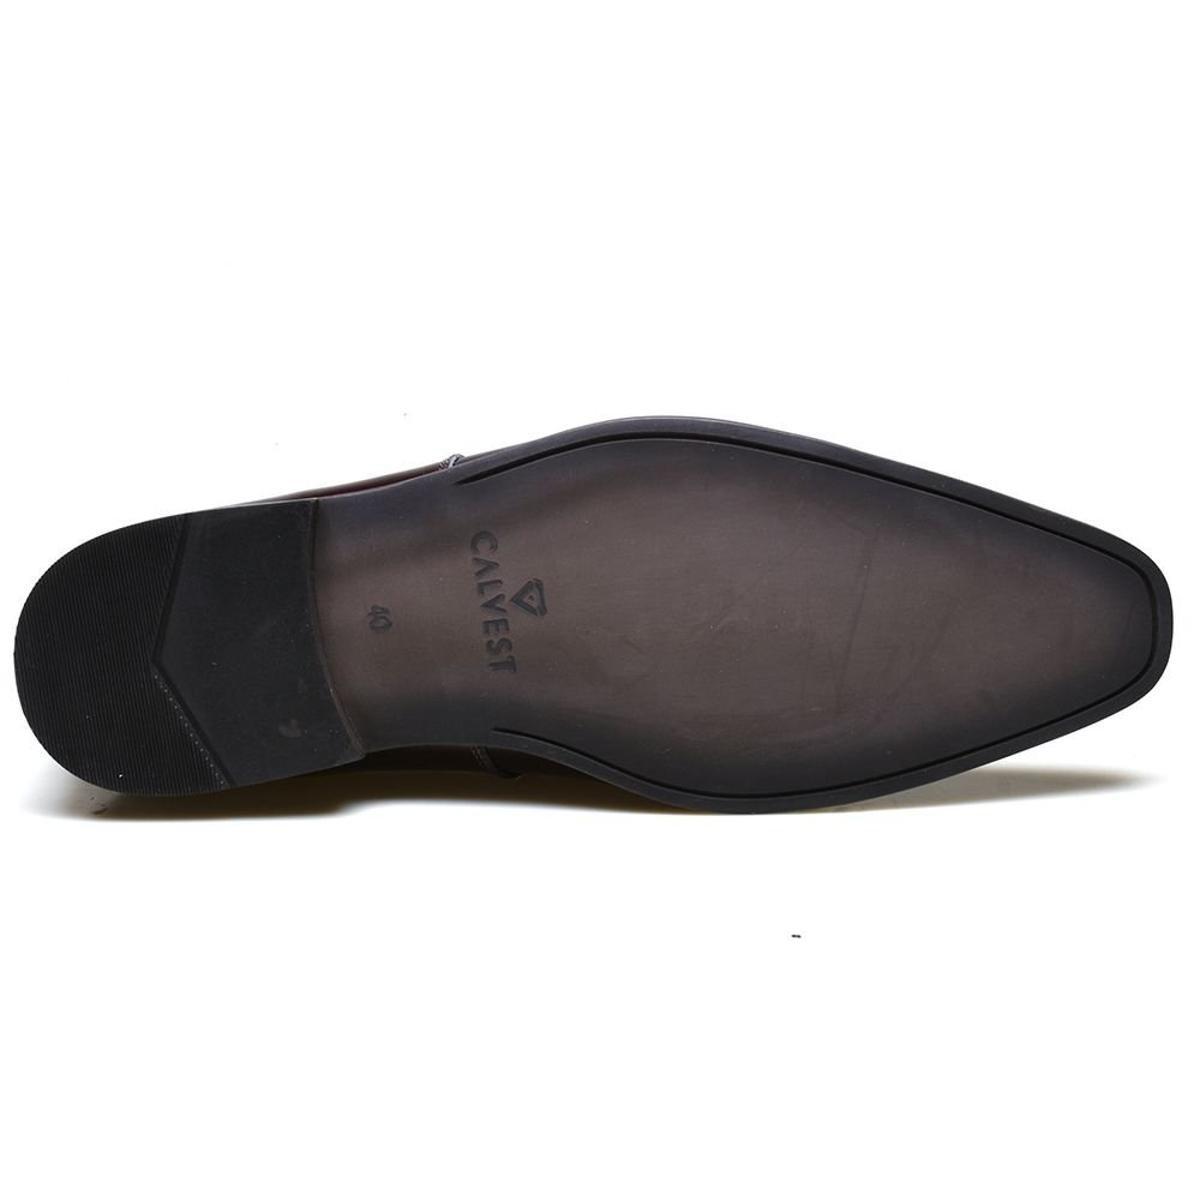 Couro Social Calvest Bordô Sapato em Sapato Social Verniz qRxE6Xcw